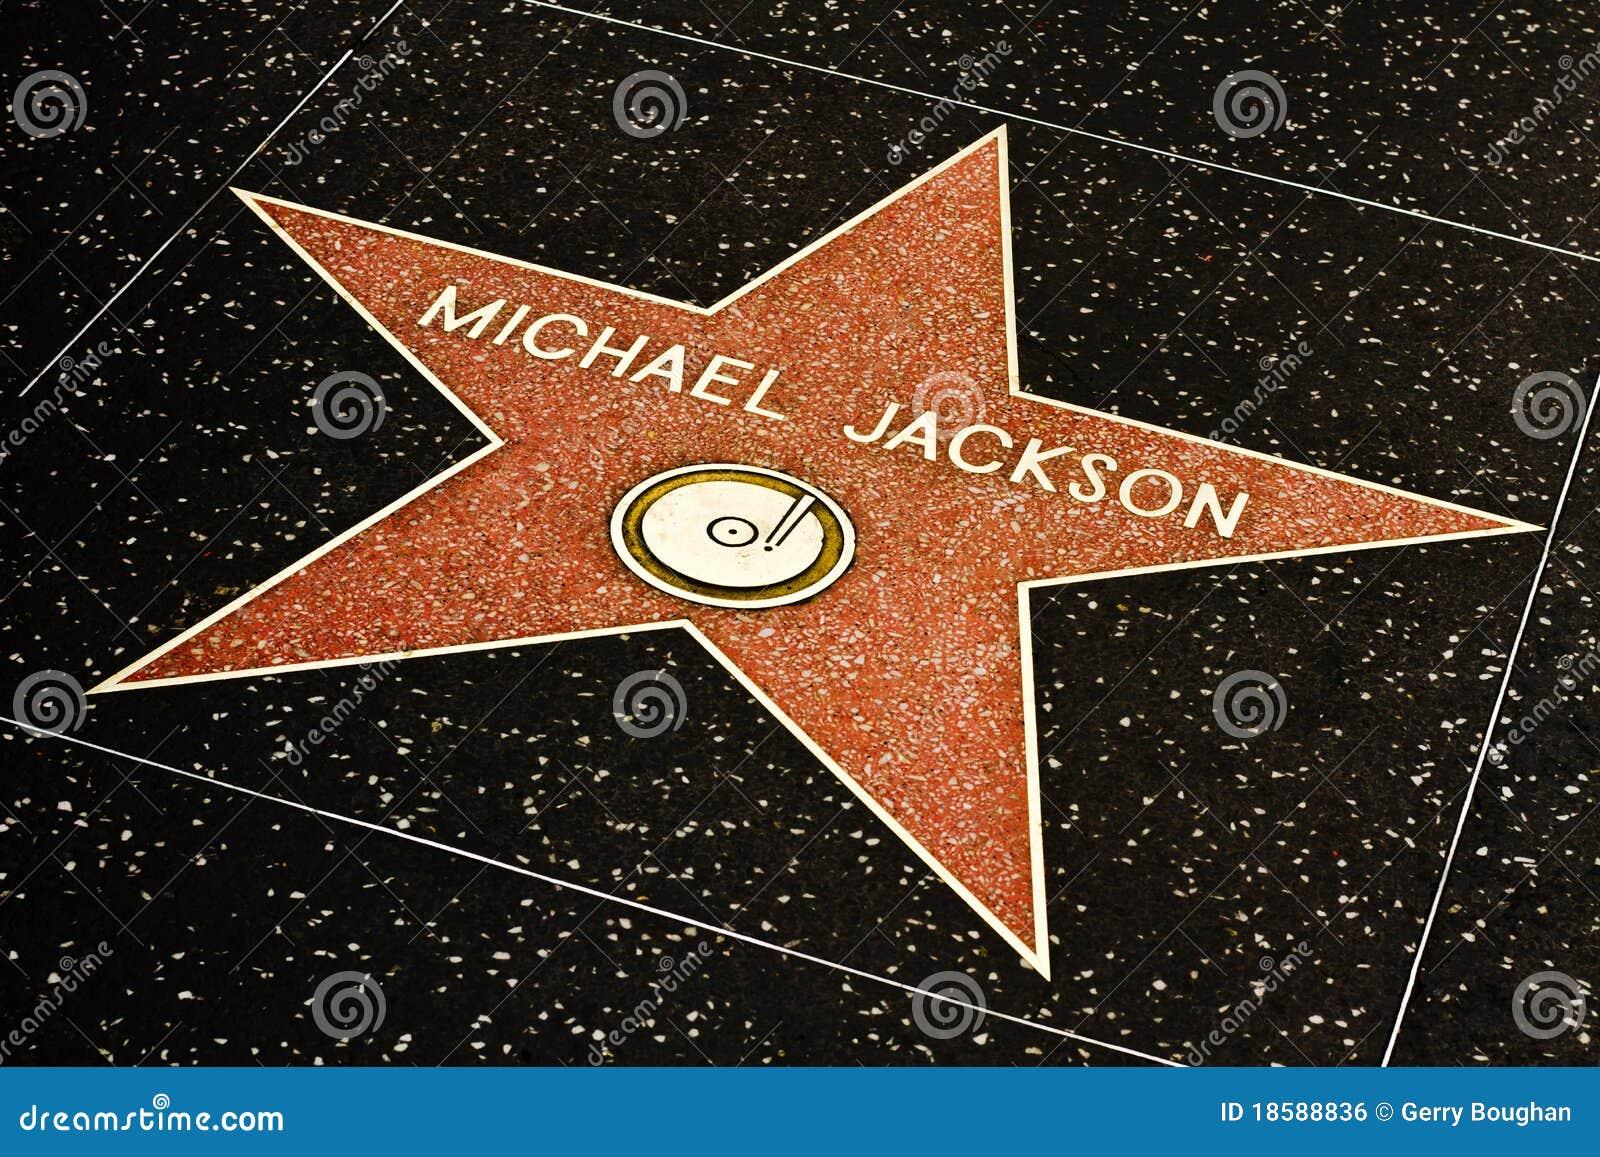 Звезда голливуд своими руками